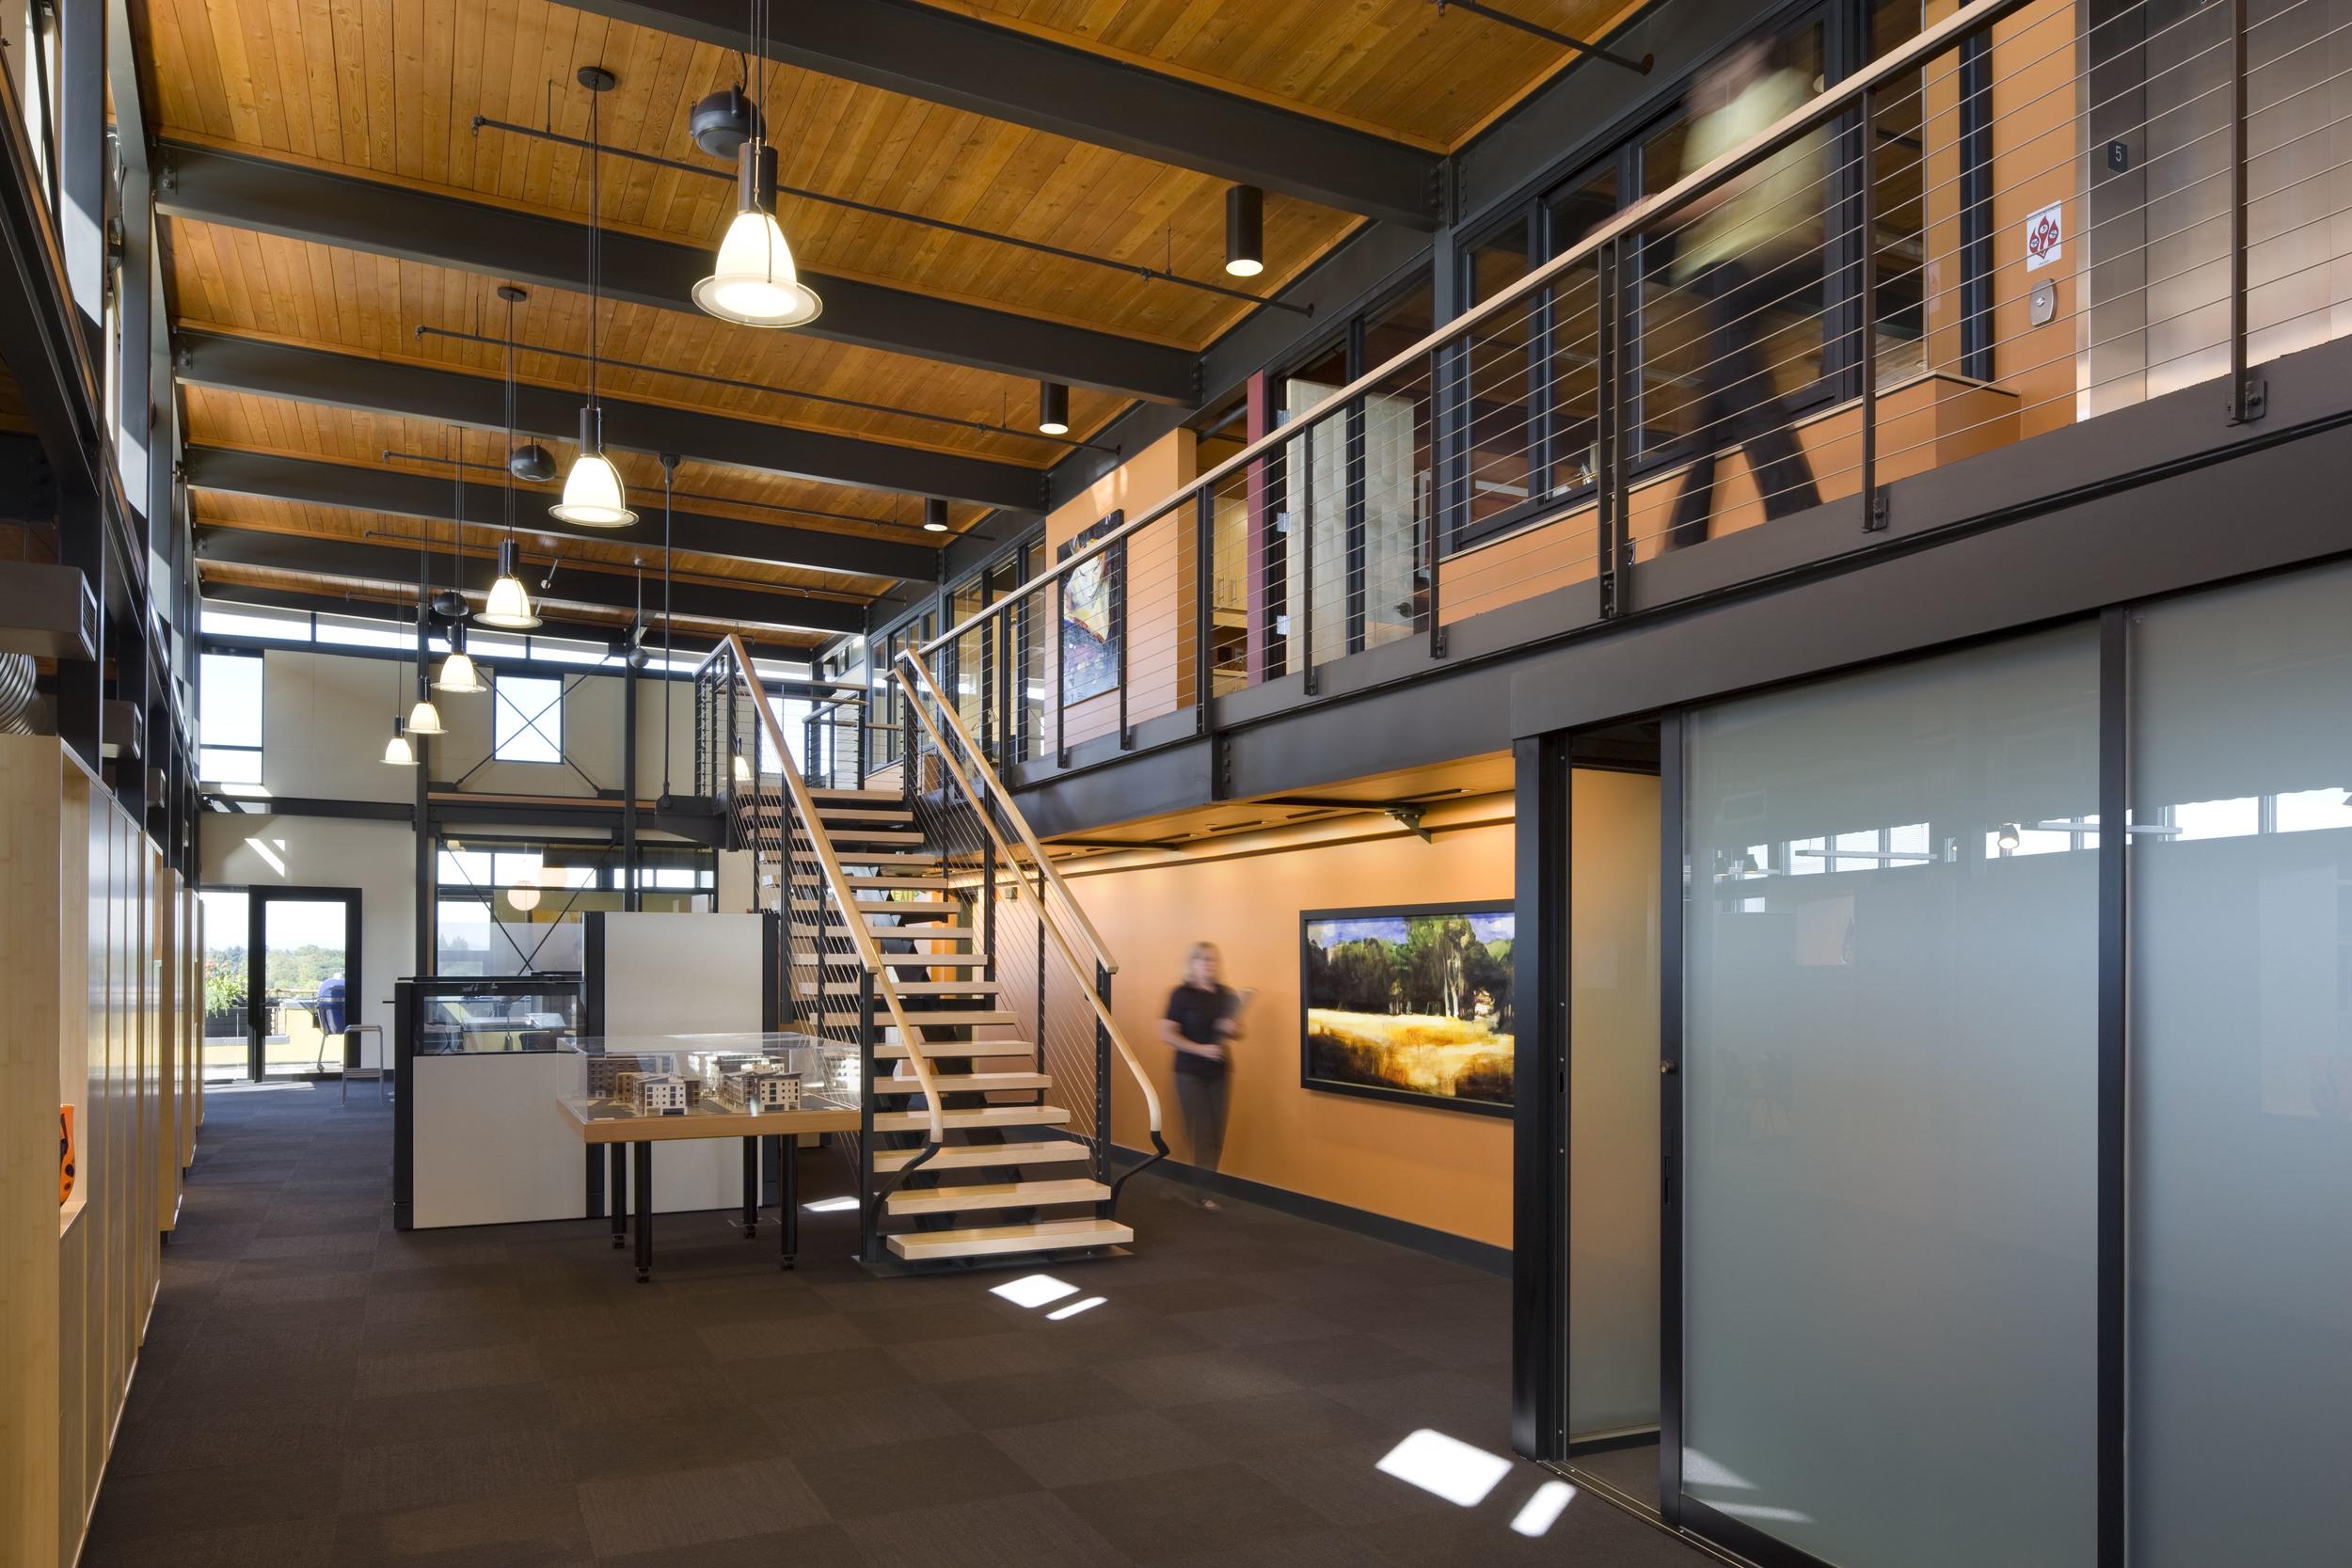 609-5_01_Arlie_Offices_main_room1.jpg